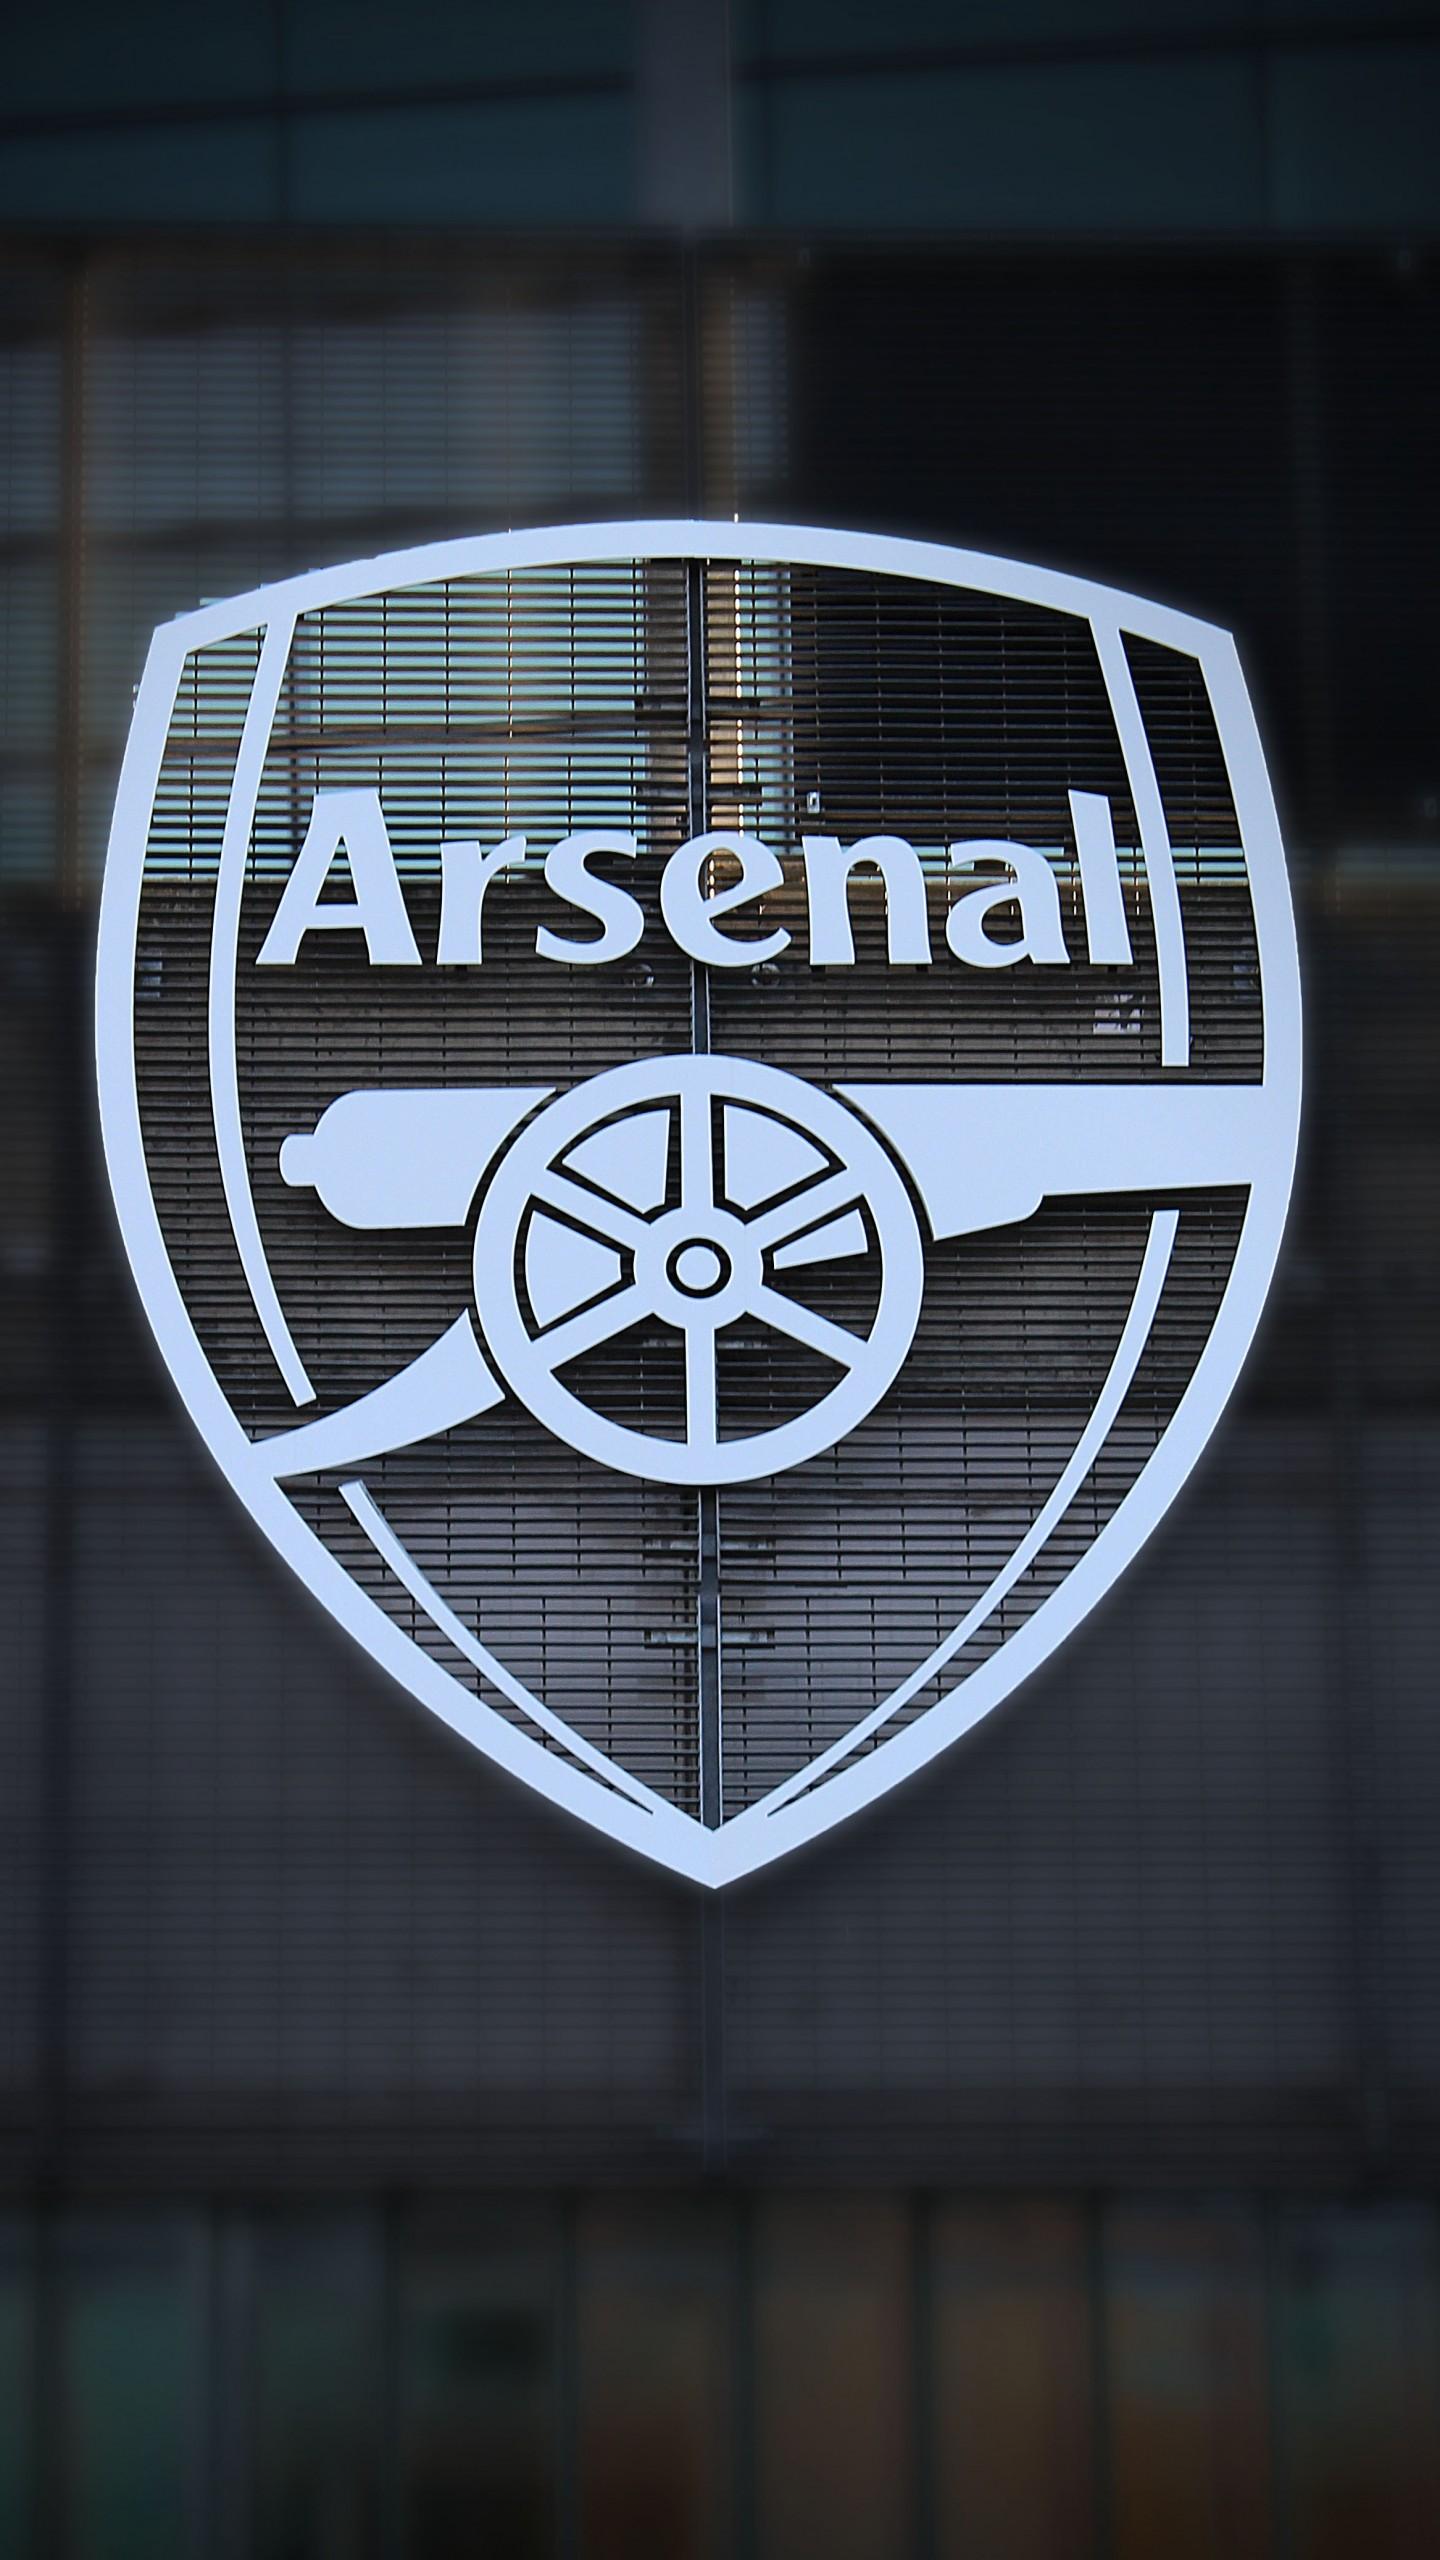 Arsenal Black And White Logo 1440x2560 Wallpaper Teahub Io